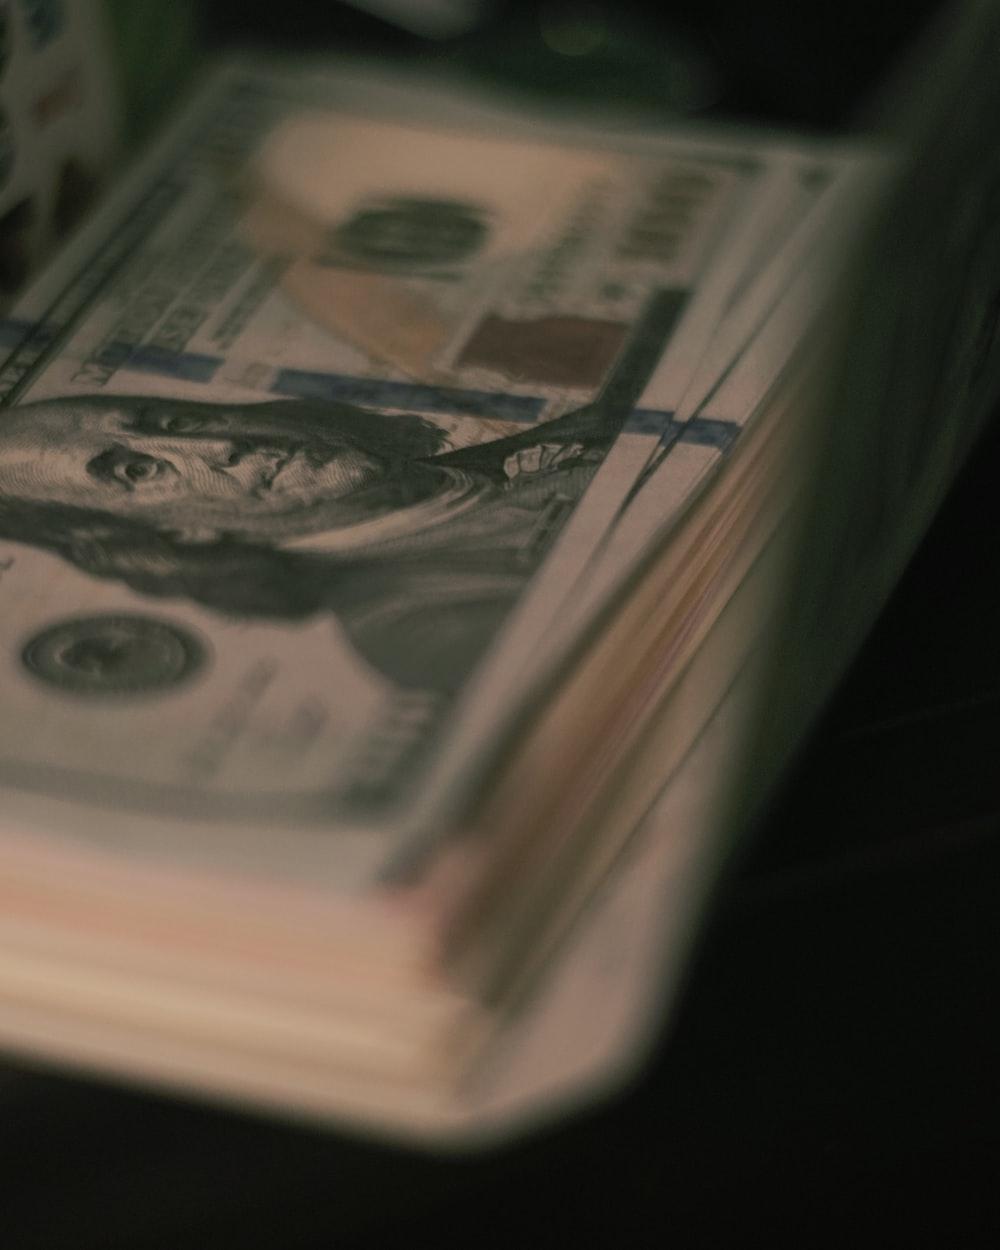 5 us dollar bill